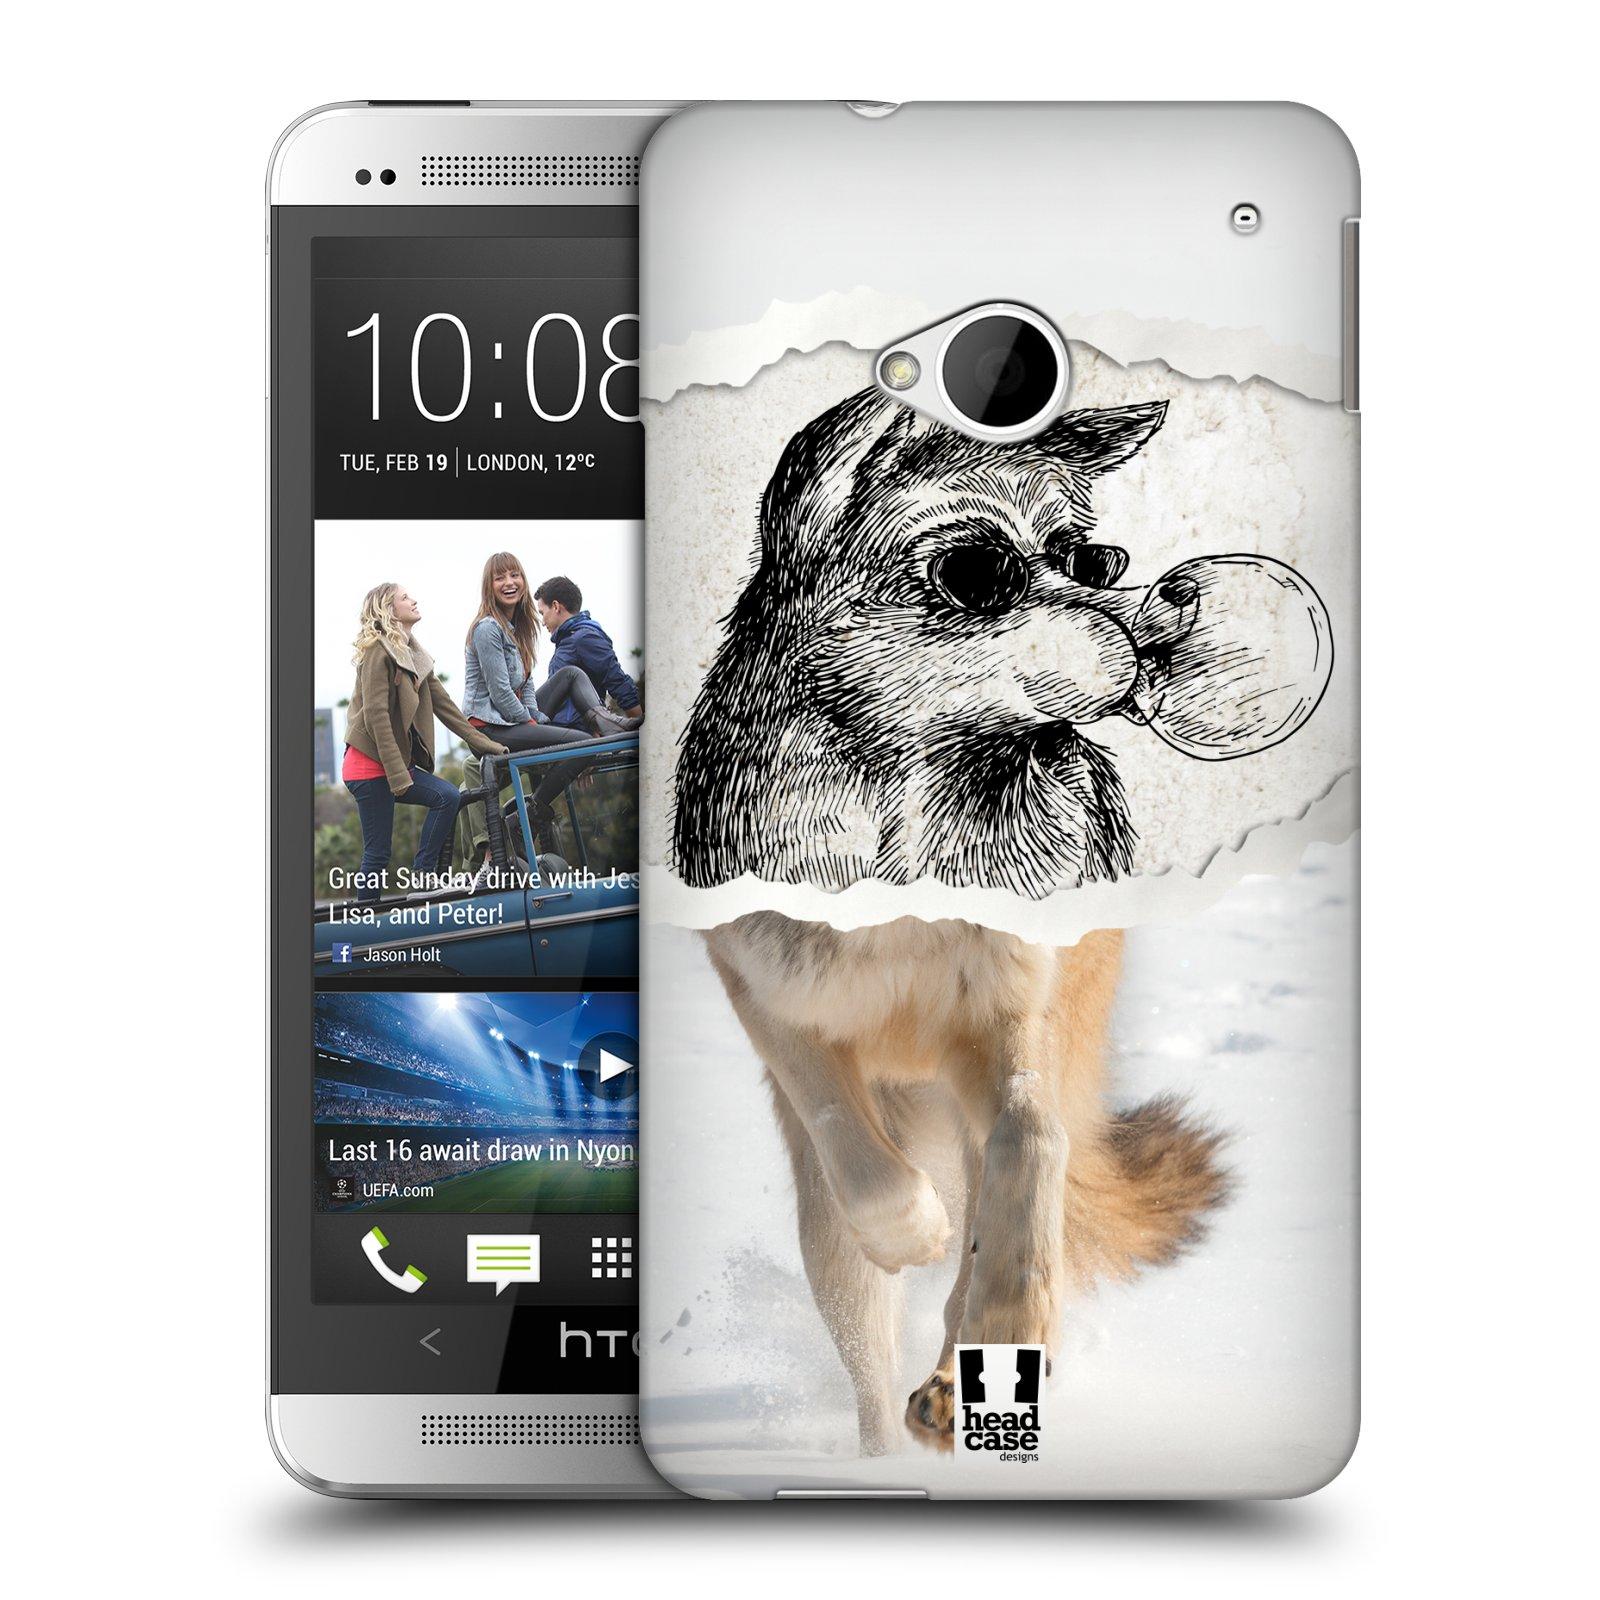 HEAD CASE plastový obal na mobil HTC One (M7) vzor zvířata koláž vlk pohodář